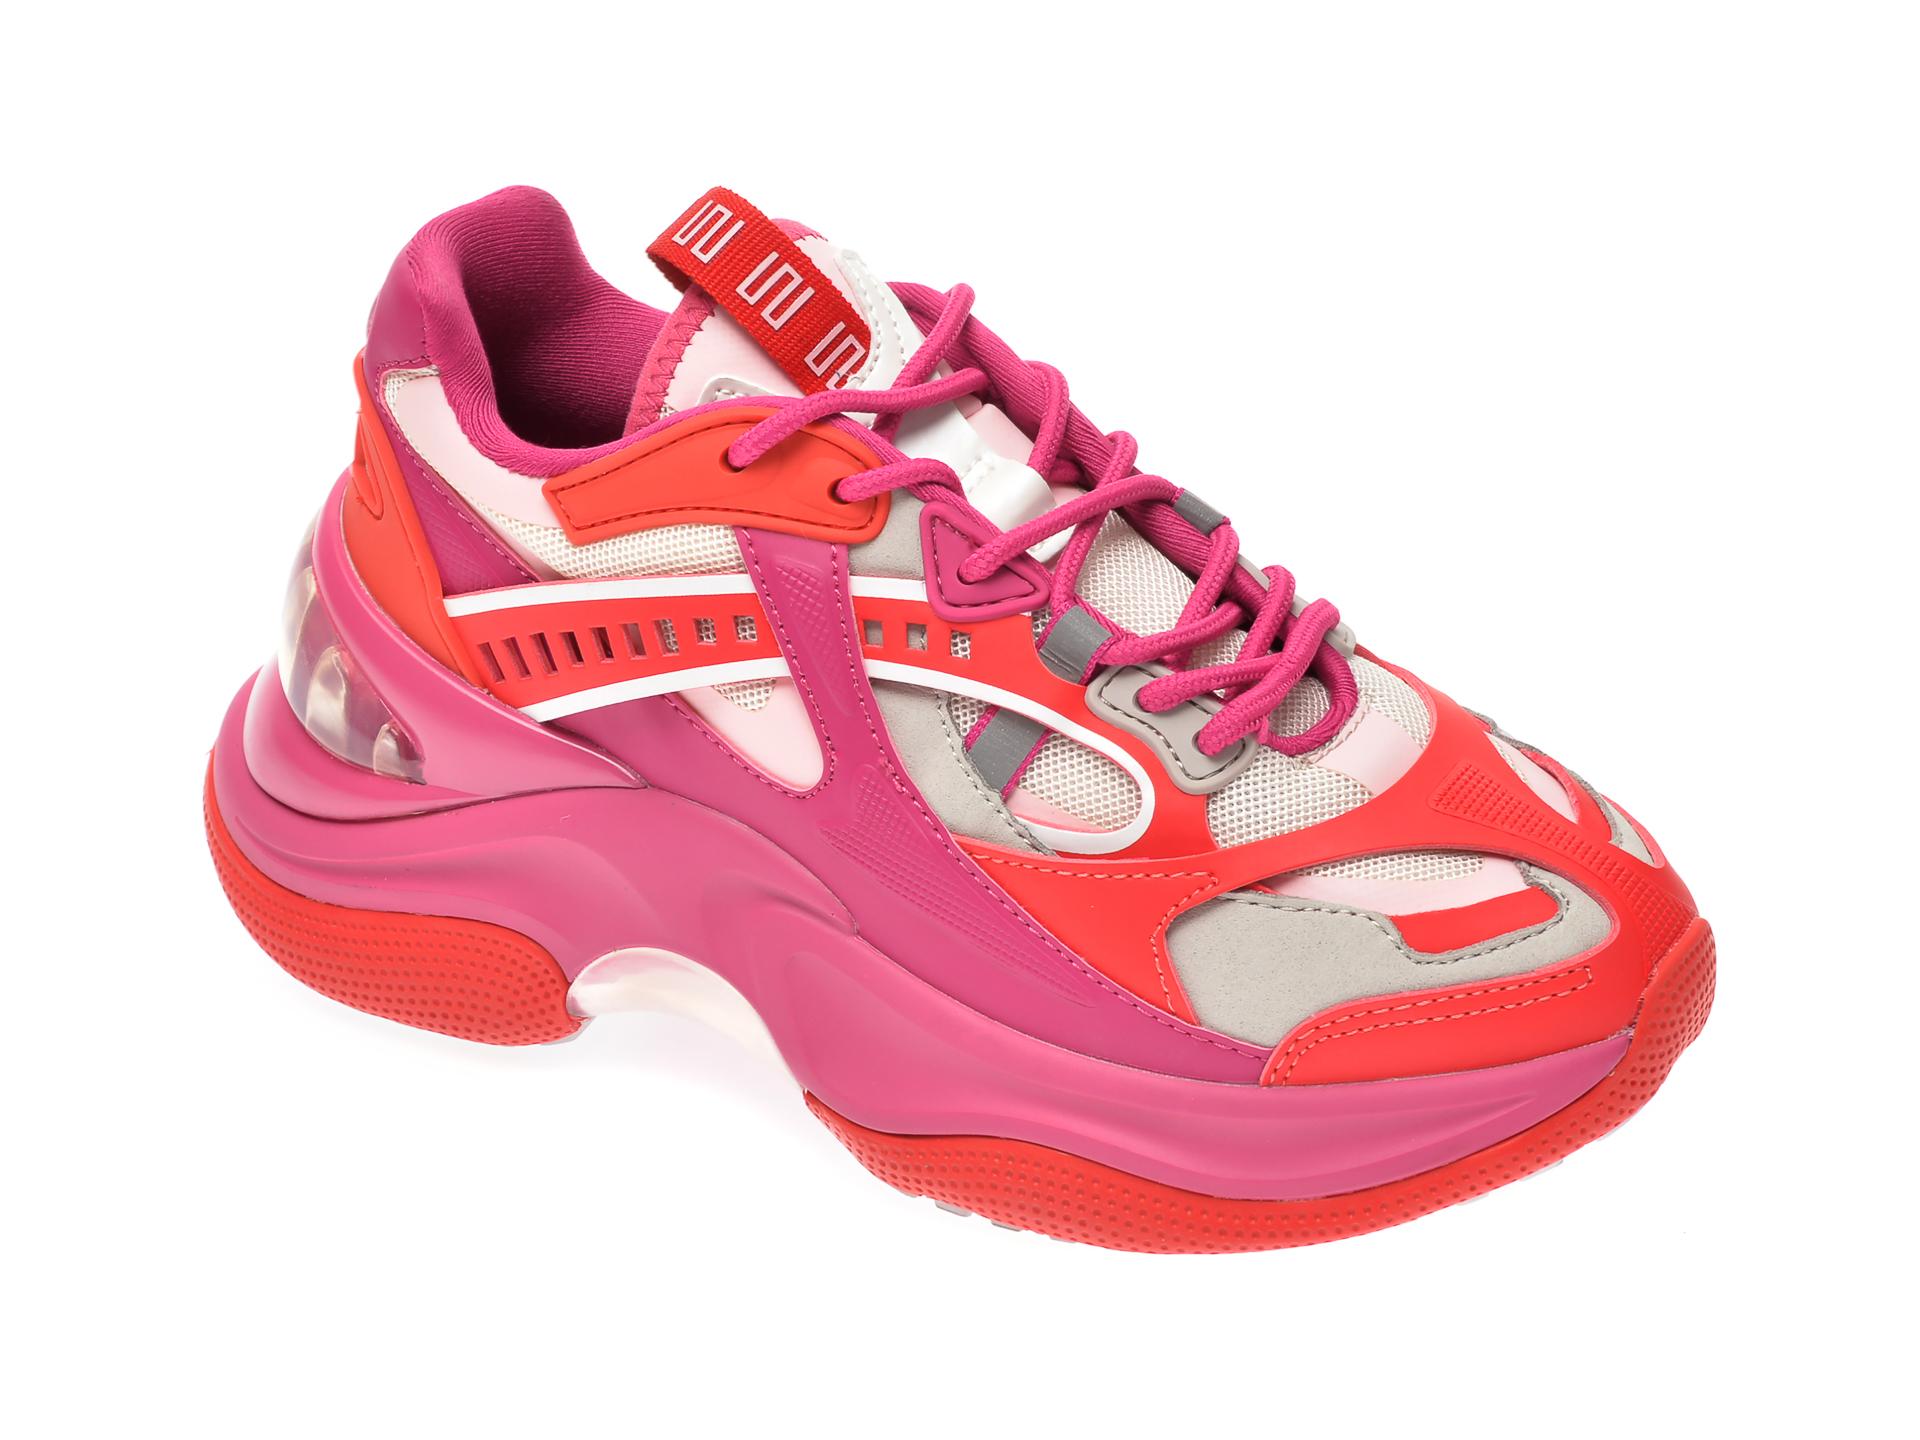 Pantofi Sport Epica Fucsia, 99998, Din Material Textil Si Piele Ecologica